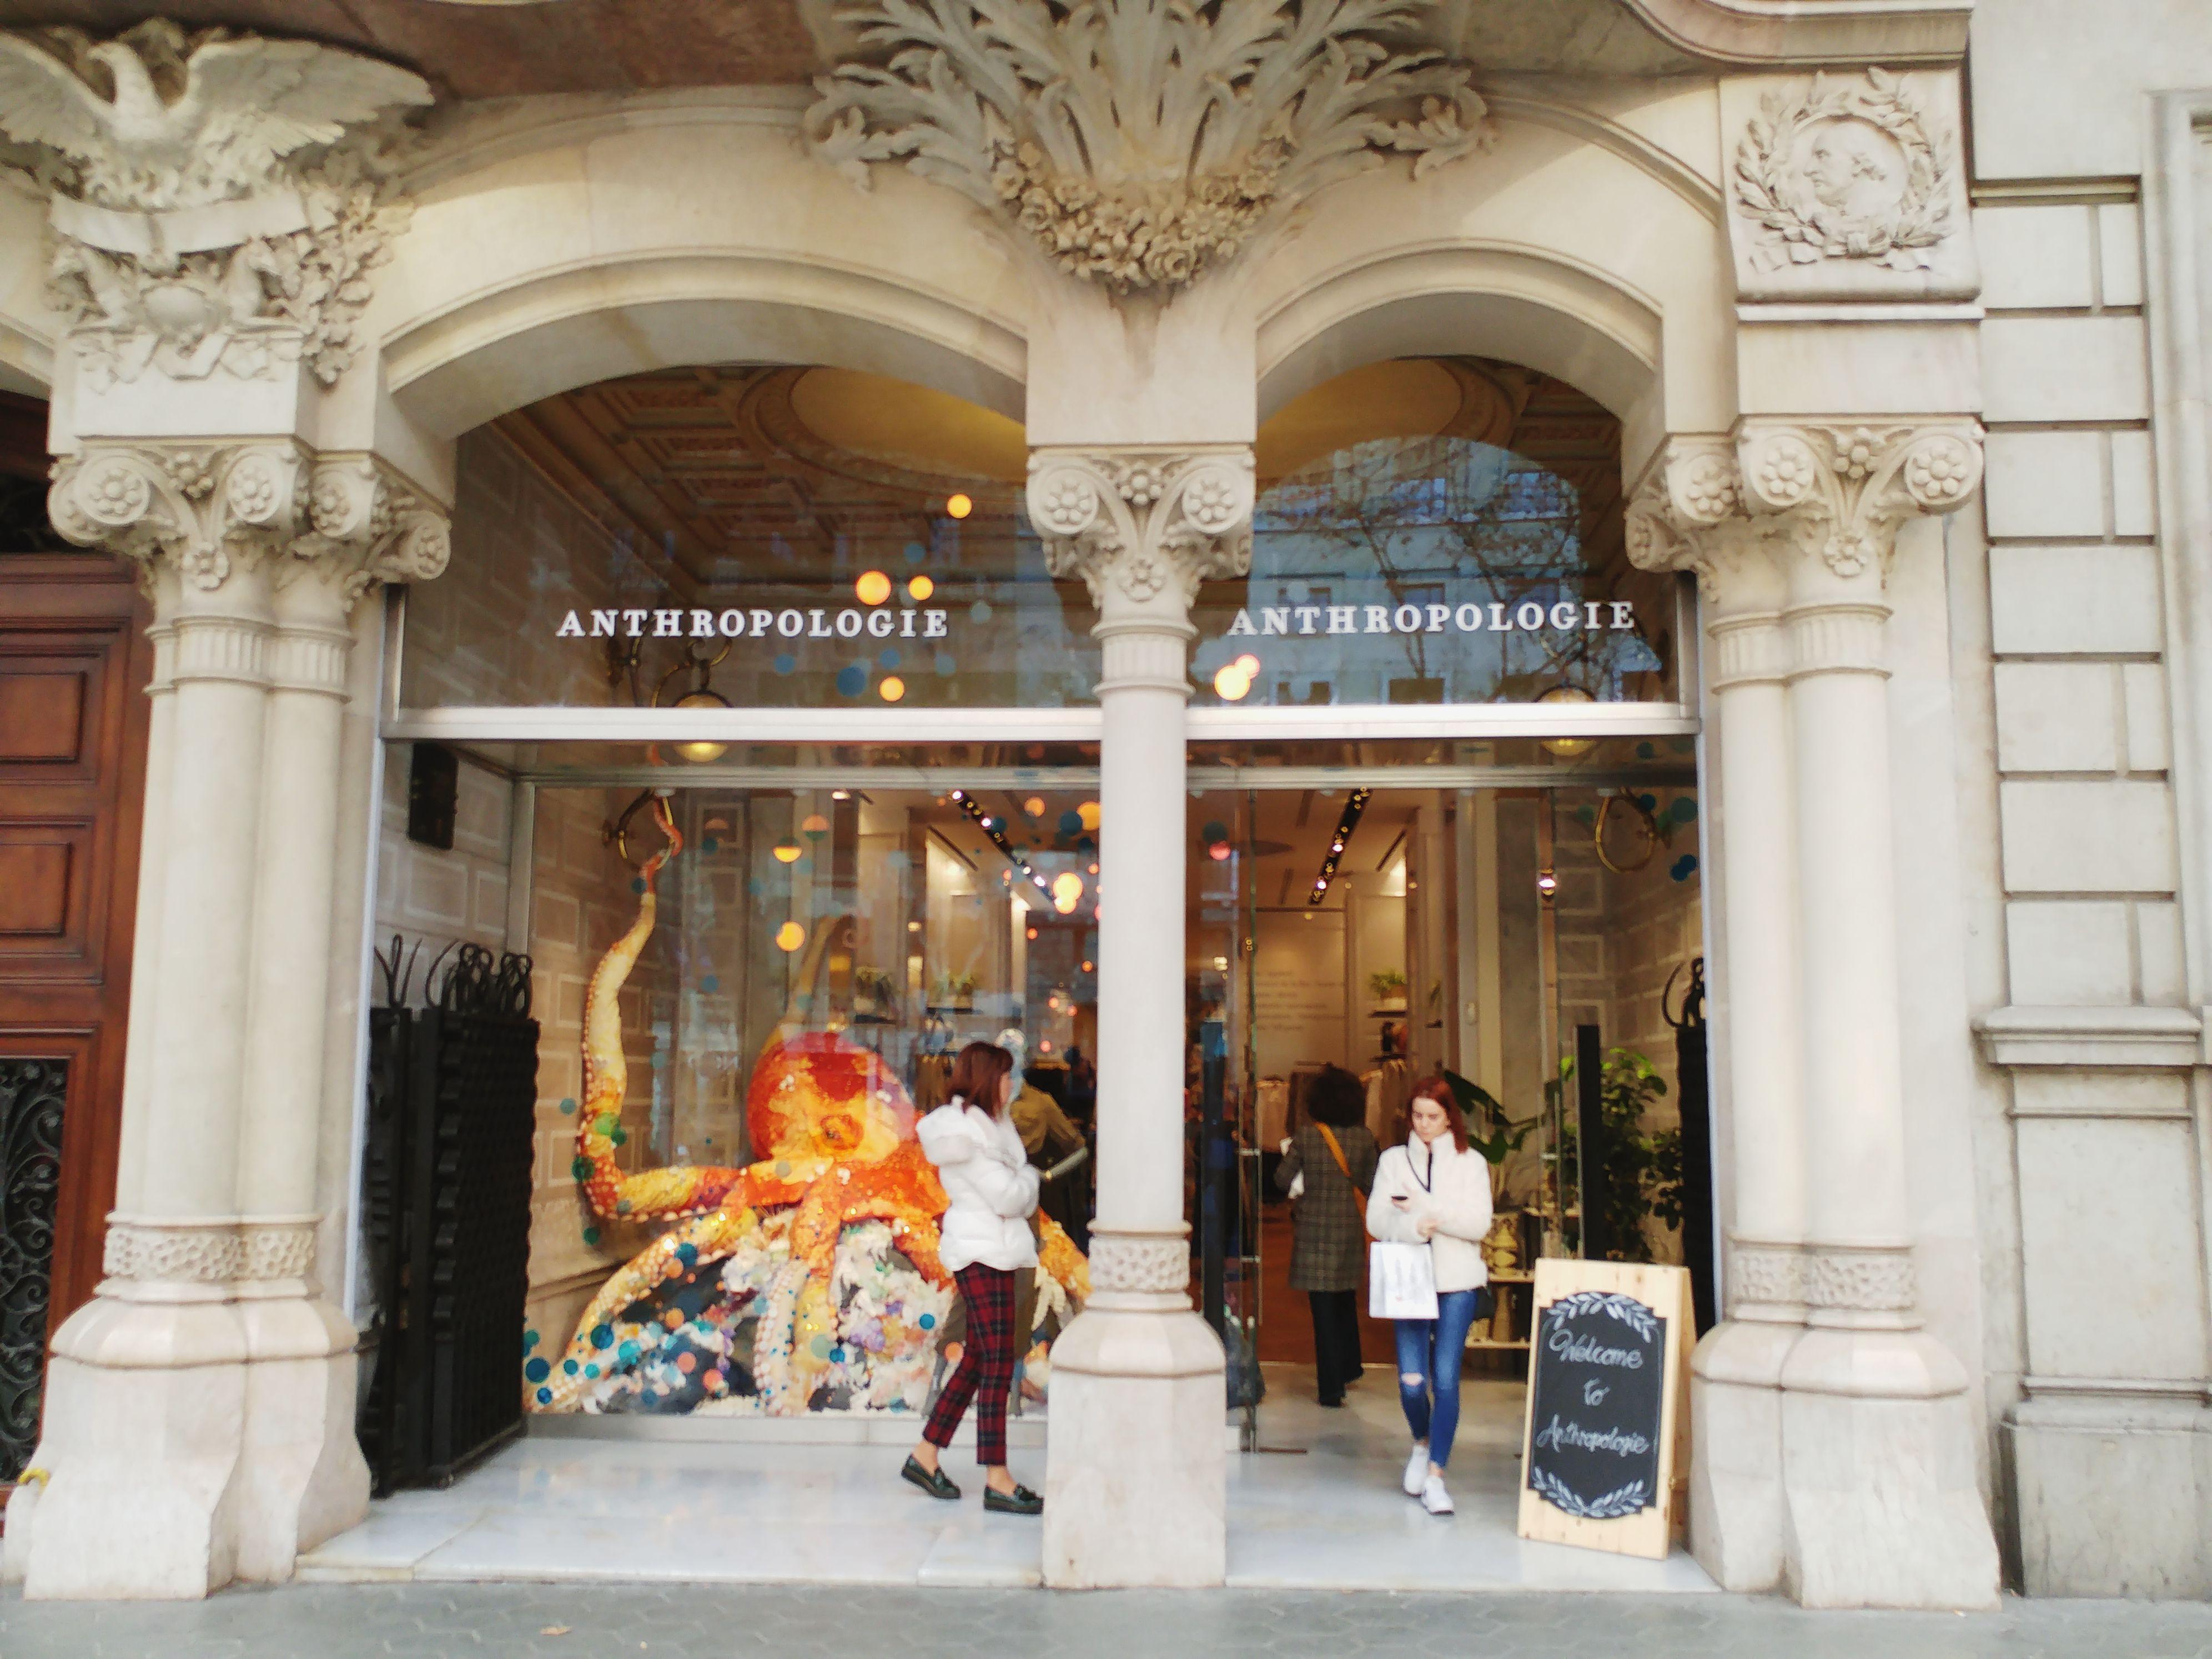 Anthropologie store at Paseo de Gracia in Barcelona